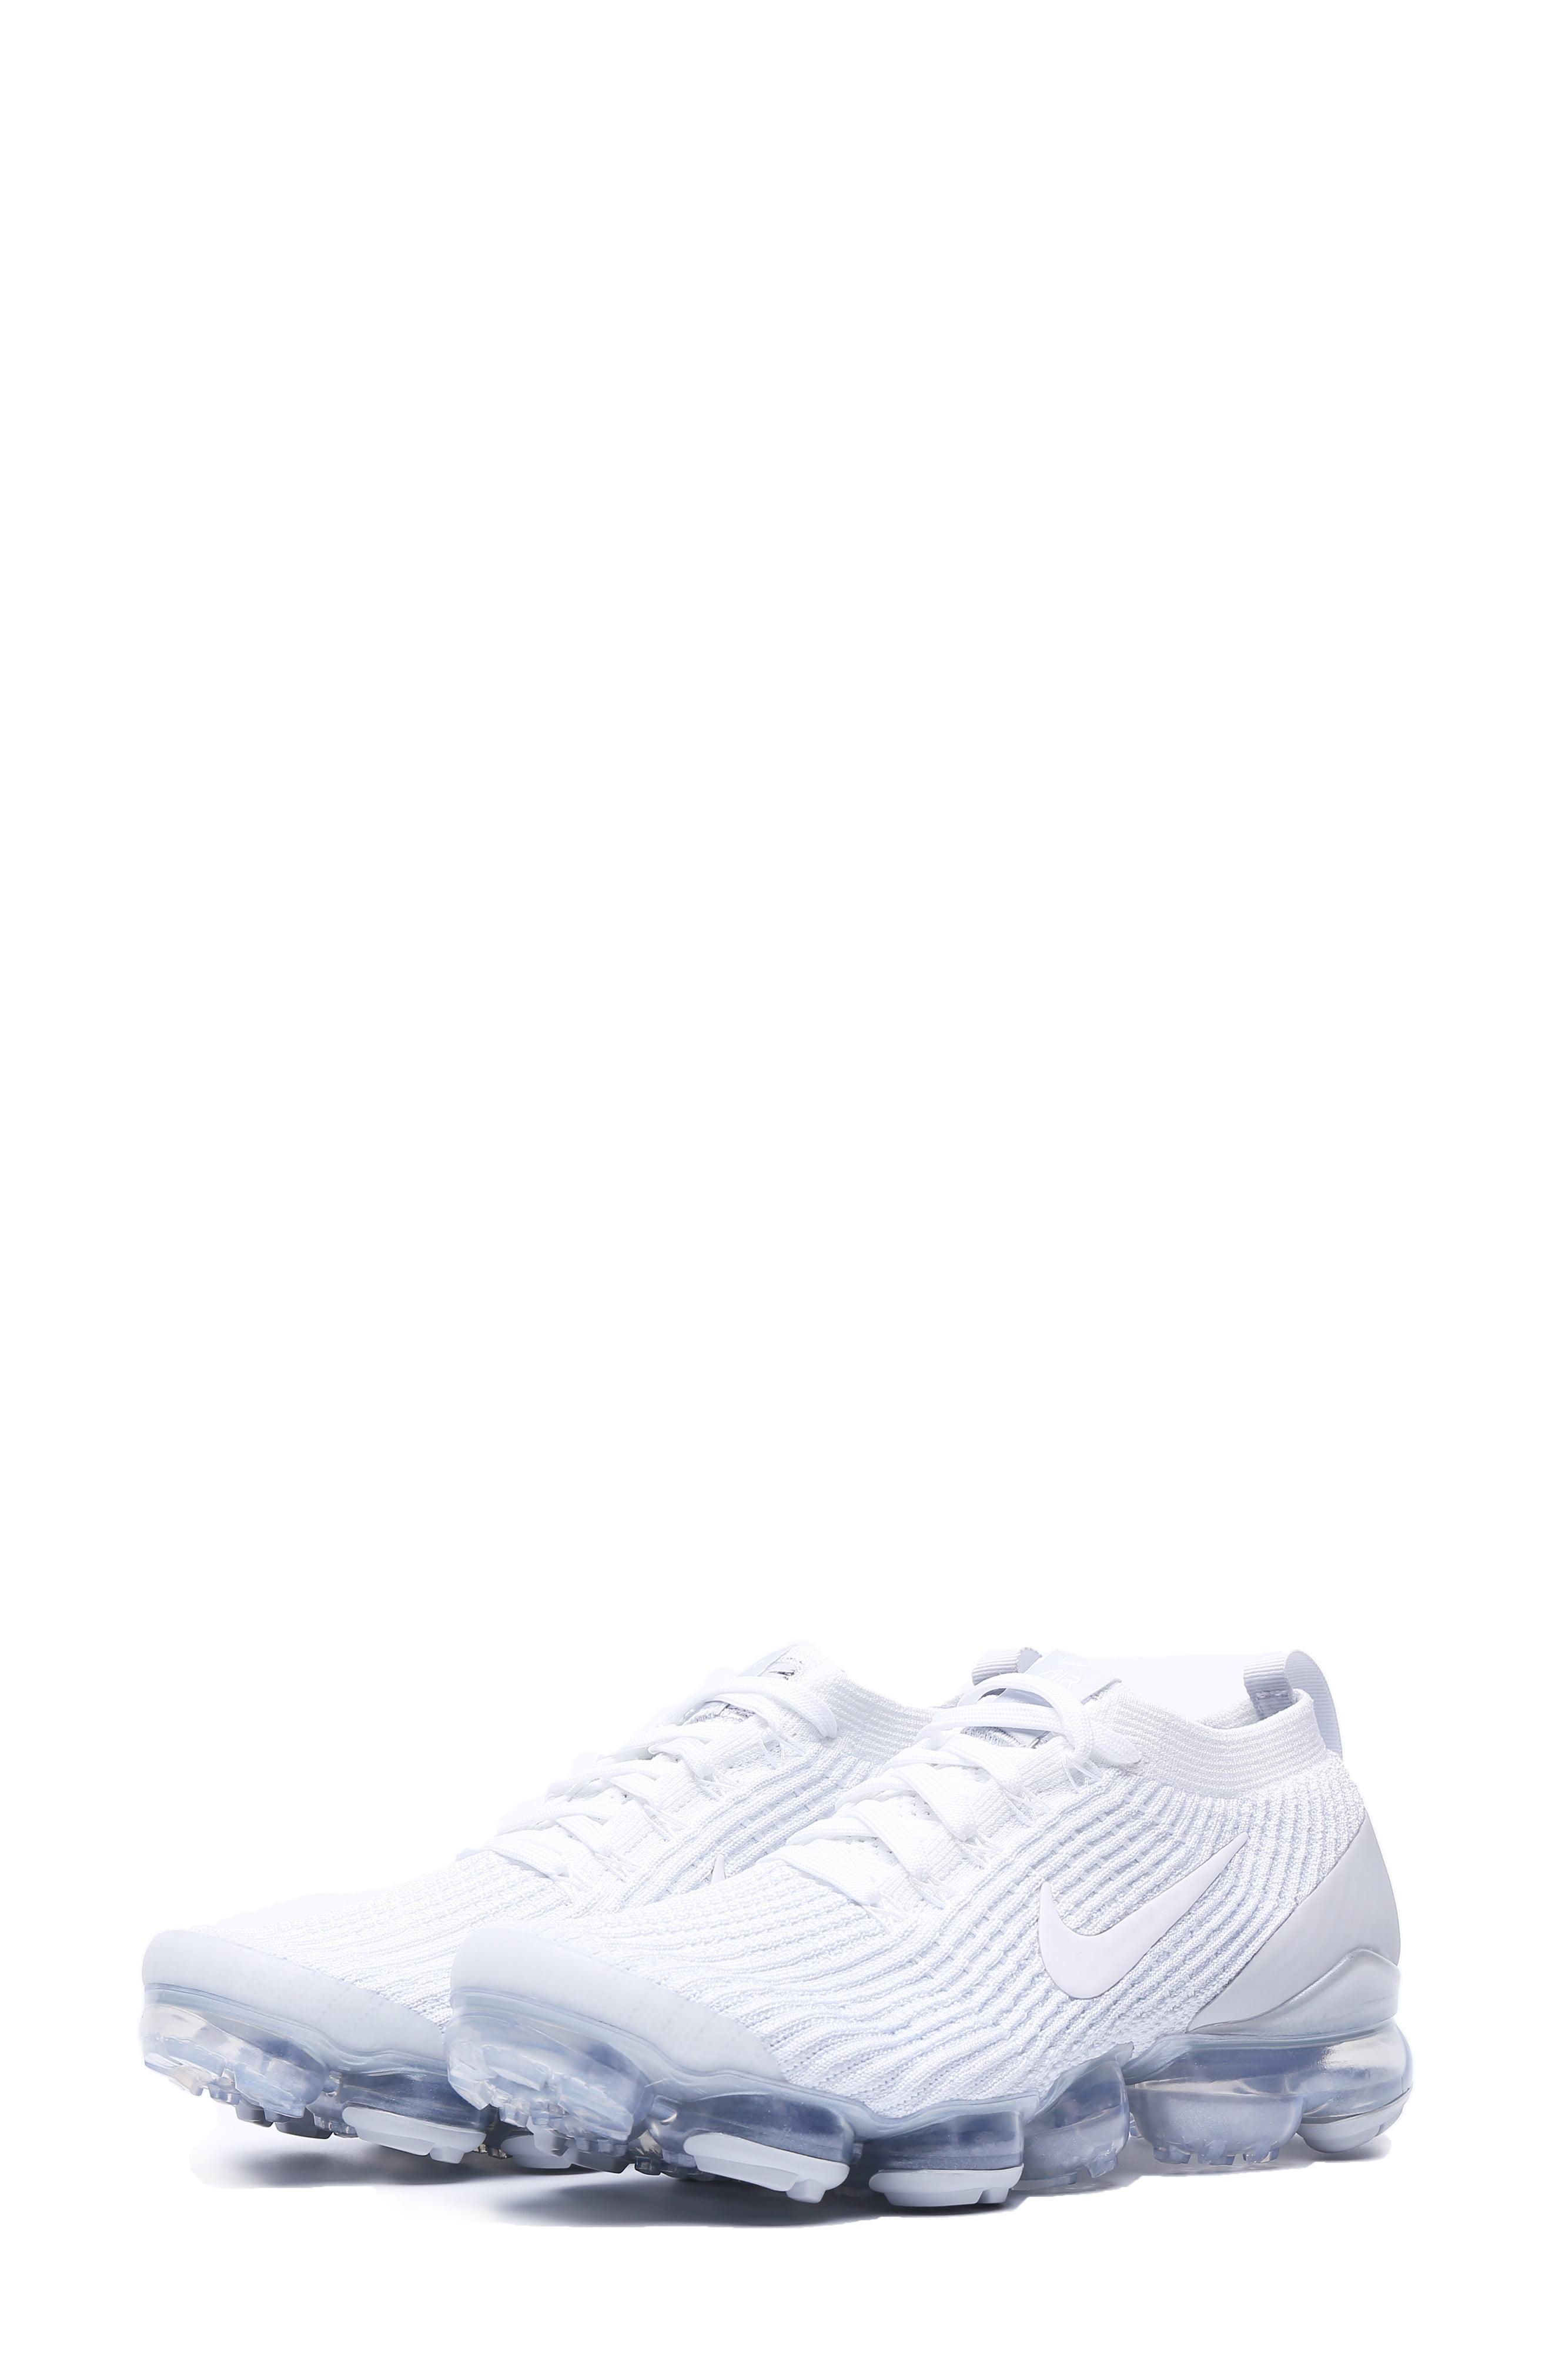 05bdfabe34a Lyst - Nike Air Vapormax Flyknit 3 Sneaker in Black